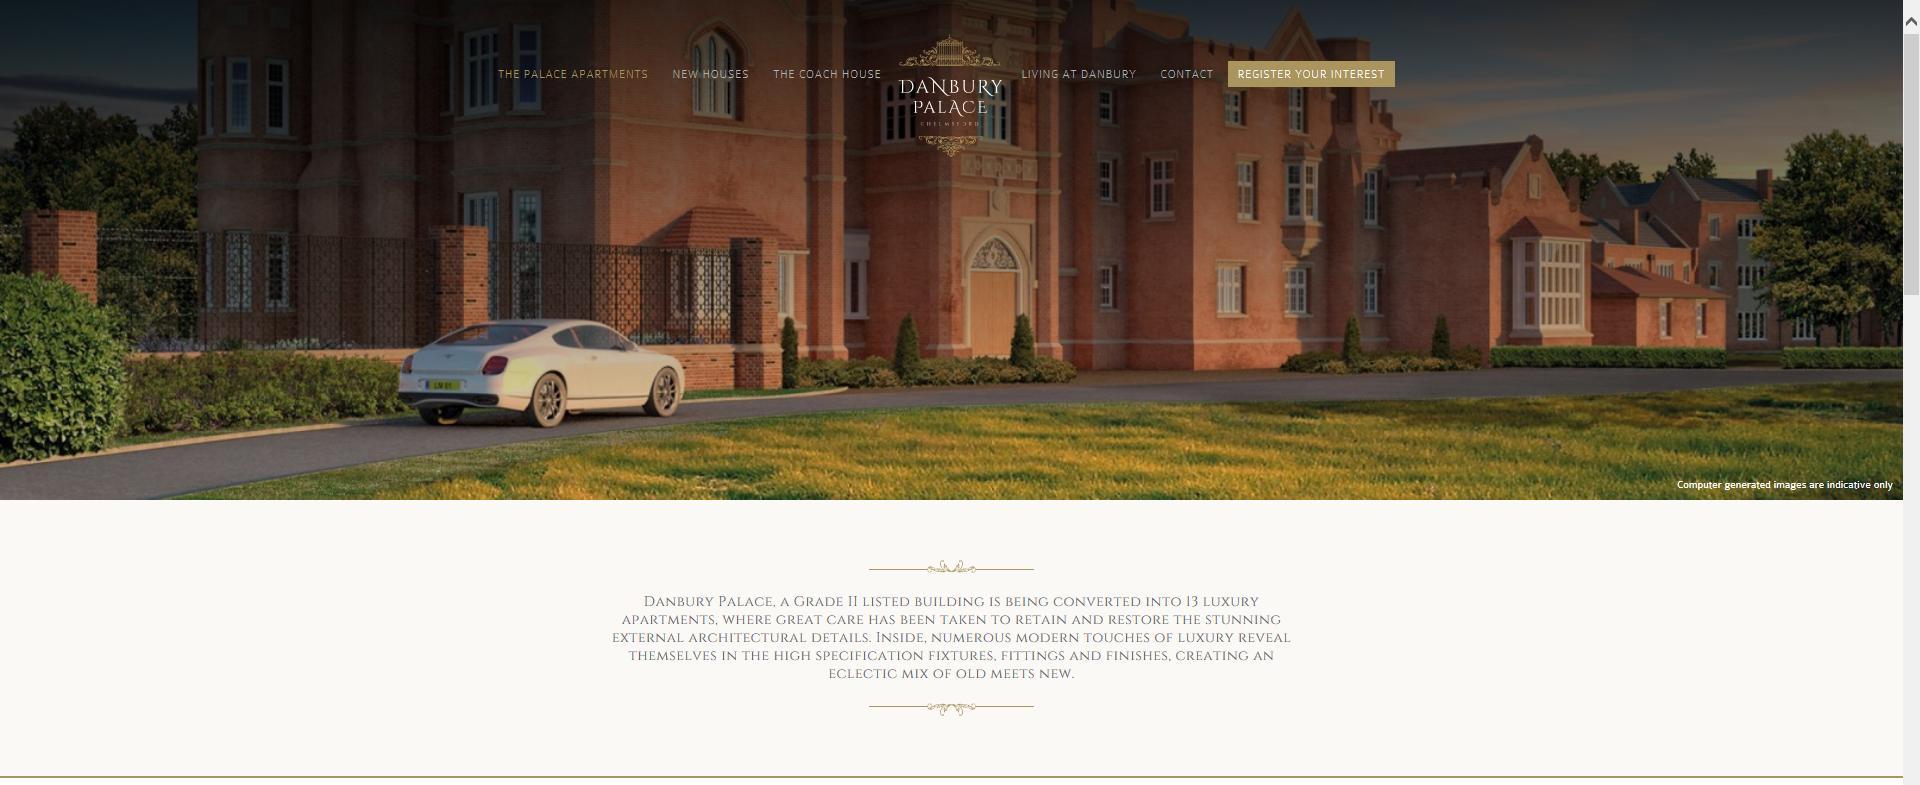 Danbury Palace development website